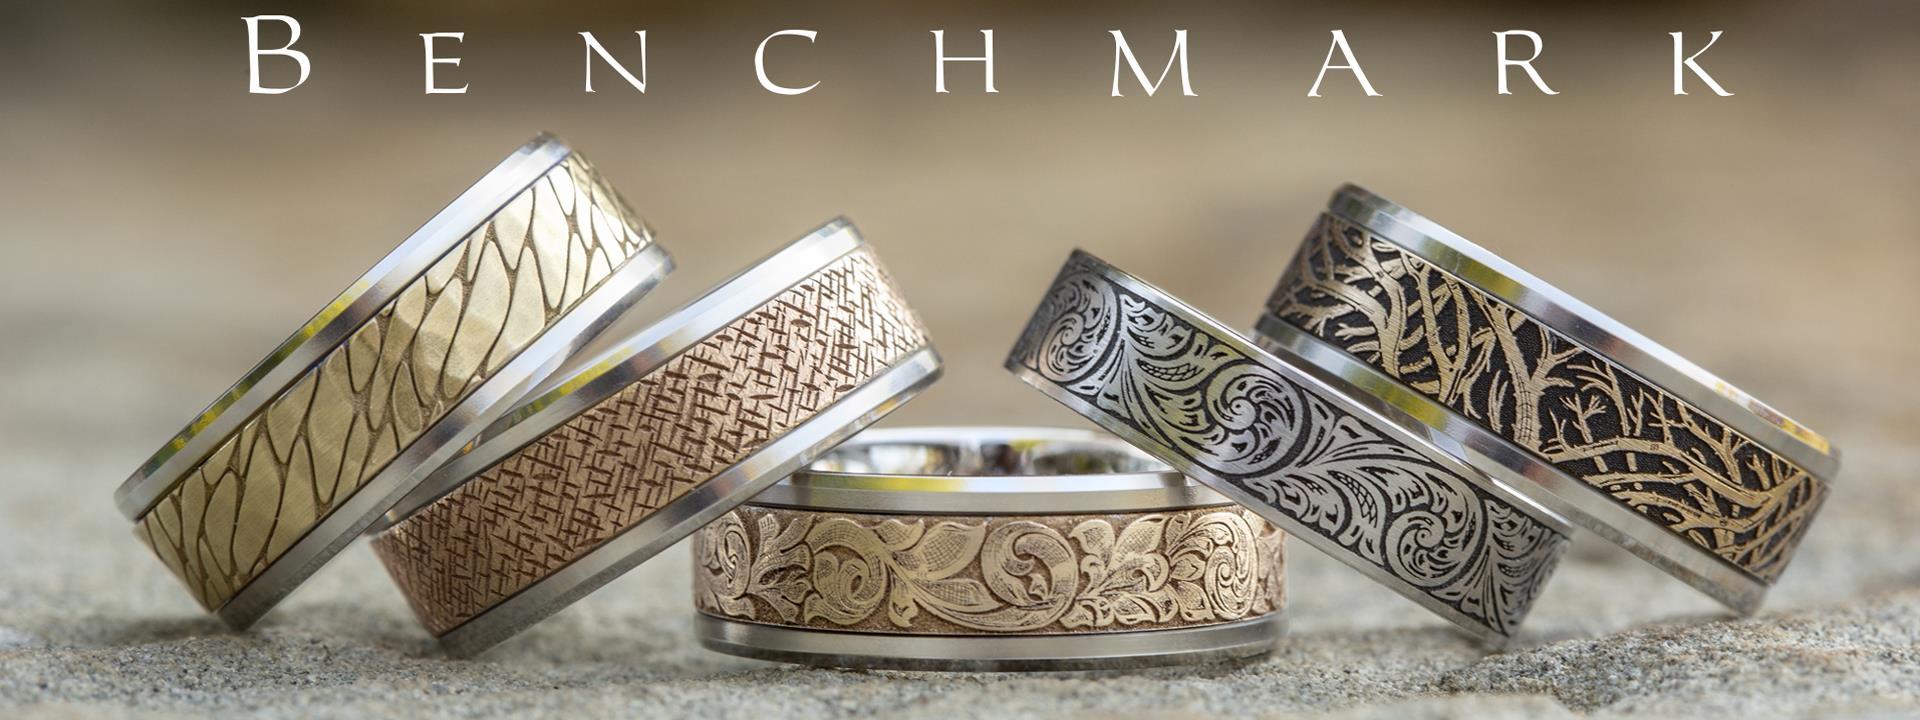 7145638e1 Skatells Jewelers: Diamonds, Engagement Rings, Rings, Diamond Rings ...